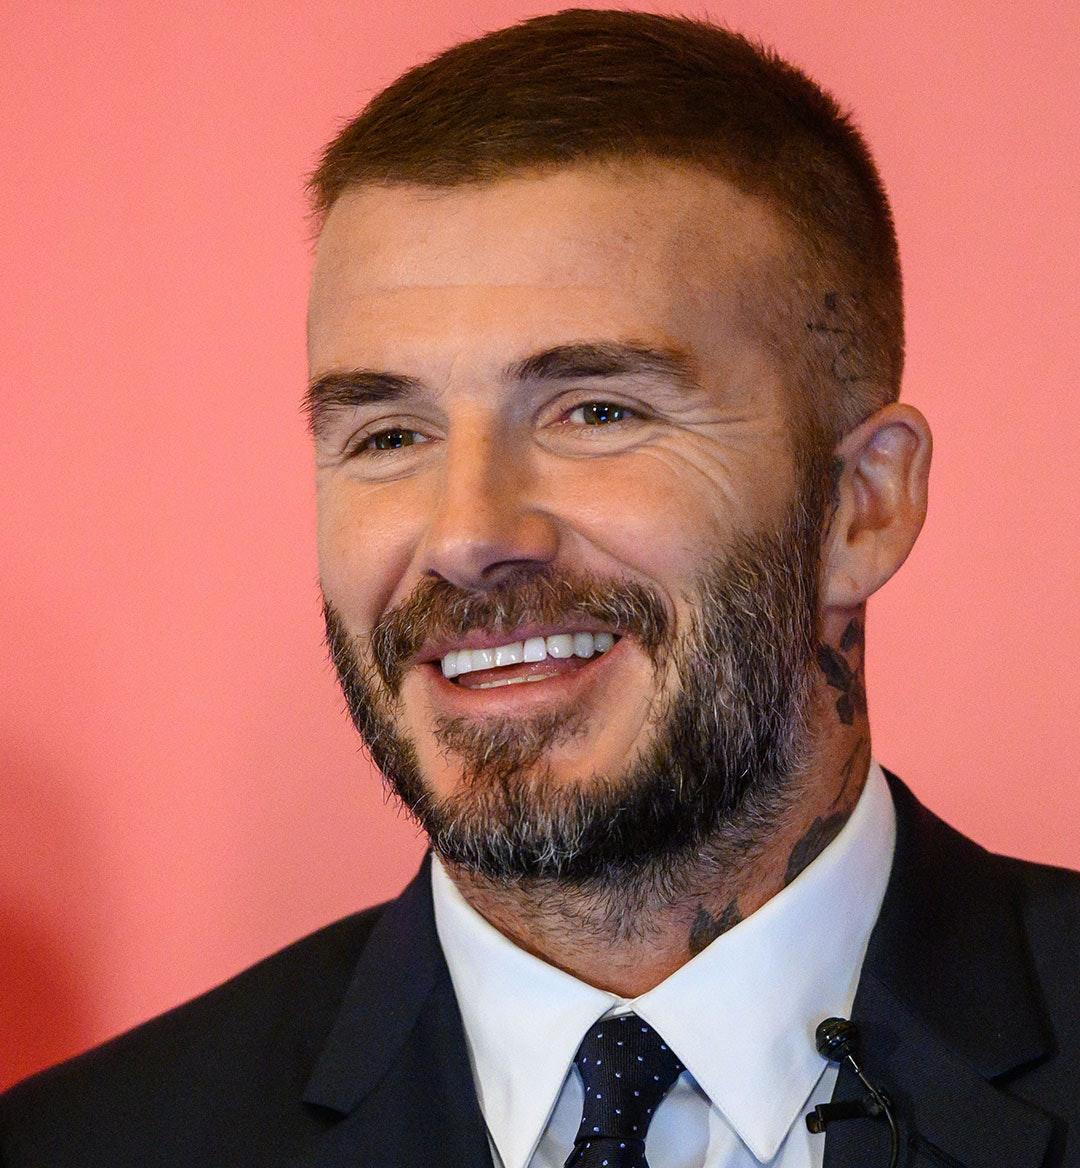 David Beckham Mobile Hero Imaeg 1080x1168